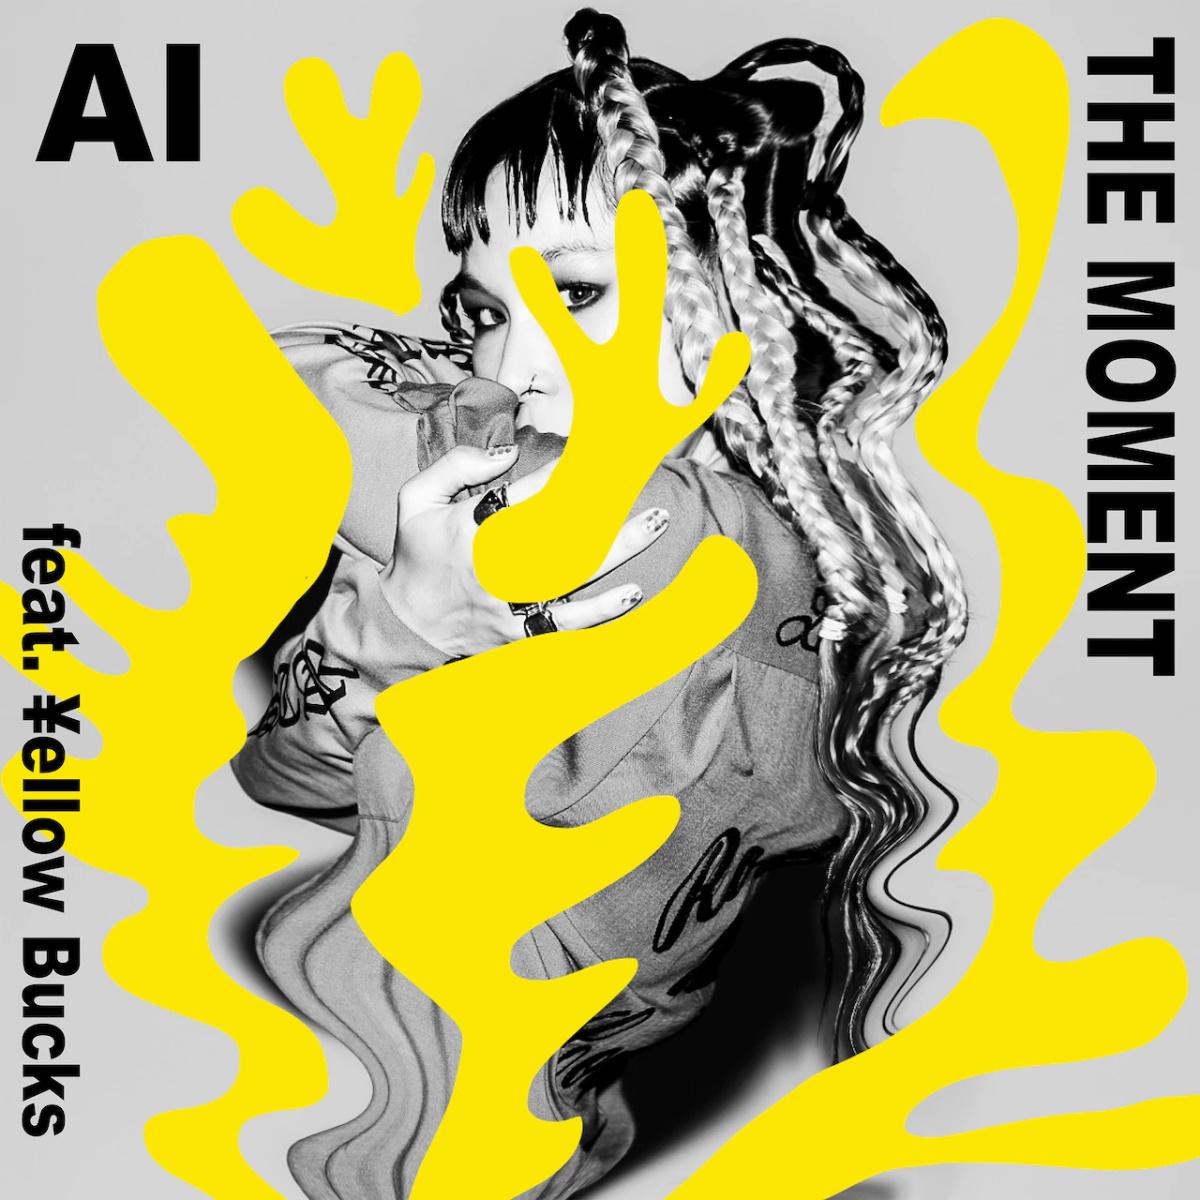 『AI - THE MOMENT feat. ¥ellow Bucks』収録の『THE MOMENT feat. ¥ellow Bucks』ジャケット